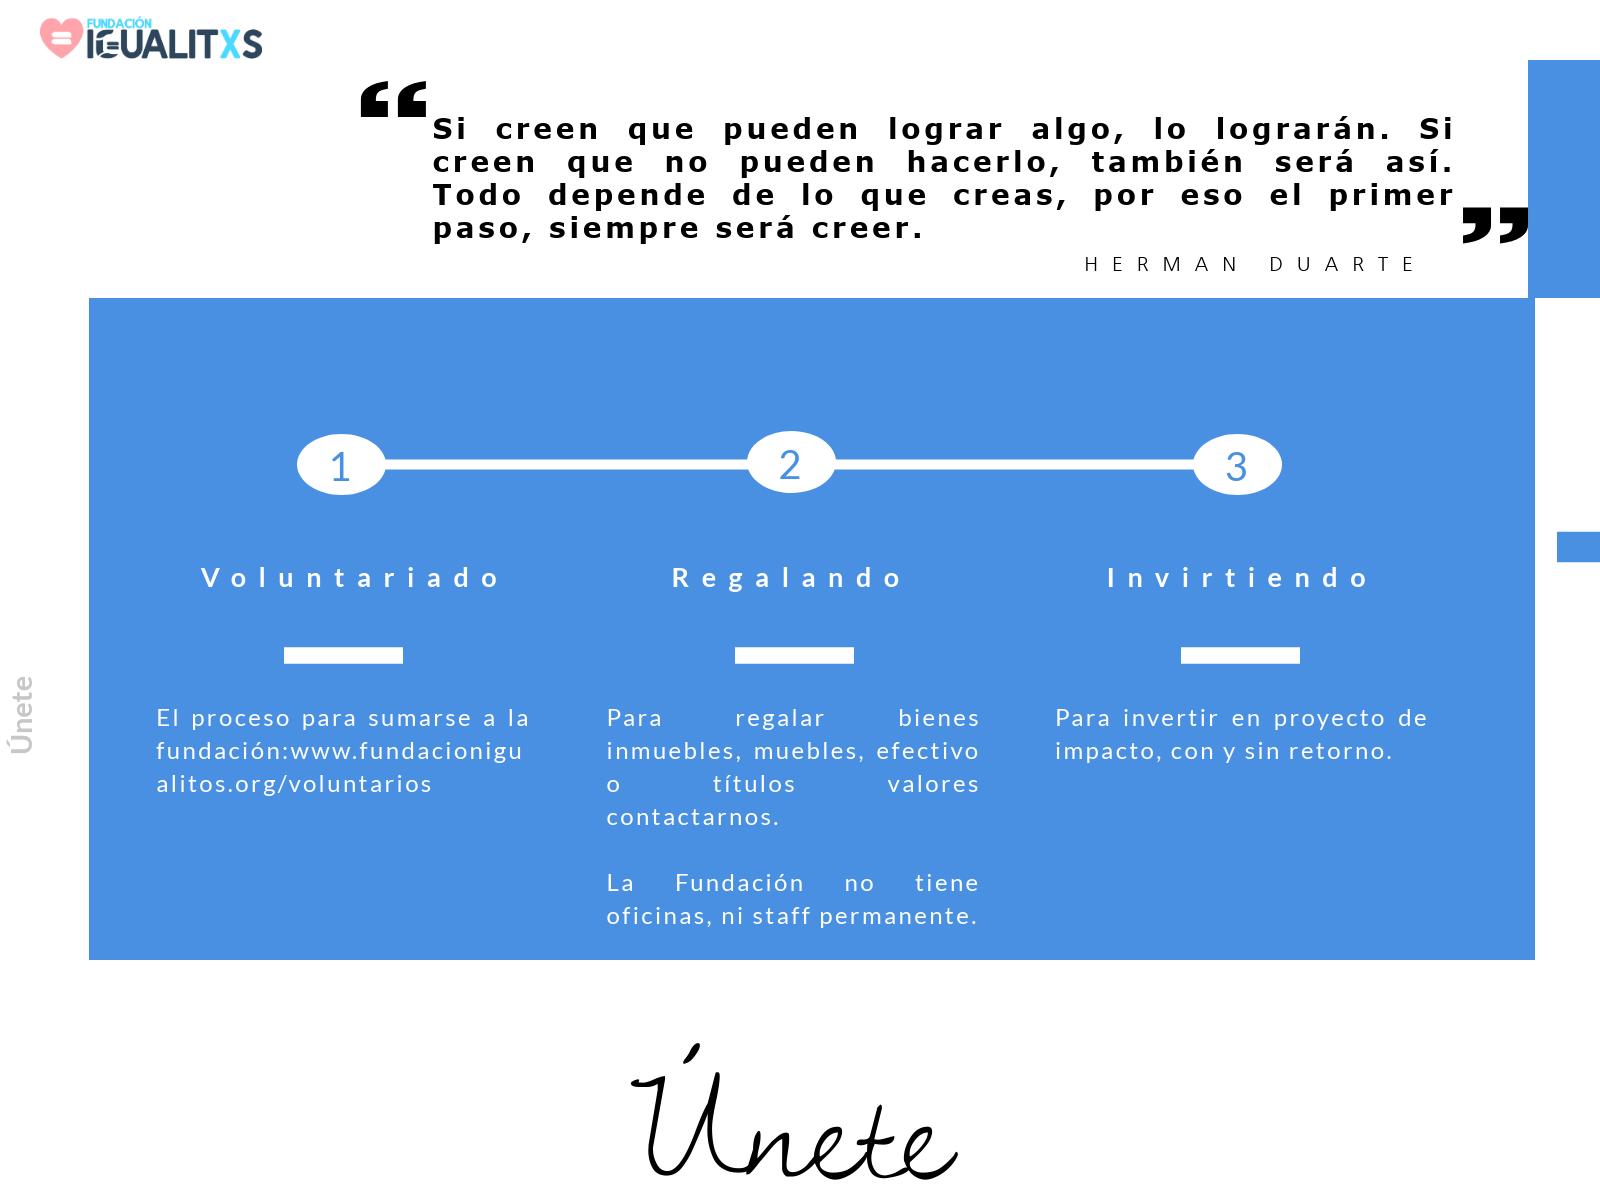 Fundacion-Igualitxs-igualitos-inversion-de-impacto-lgbt-latinoamérica-costa-rica